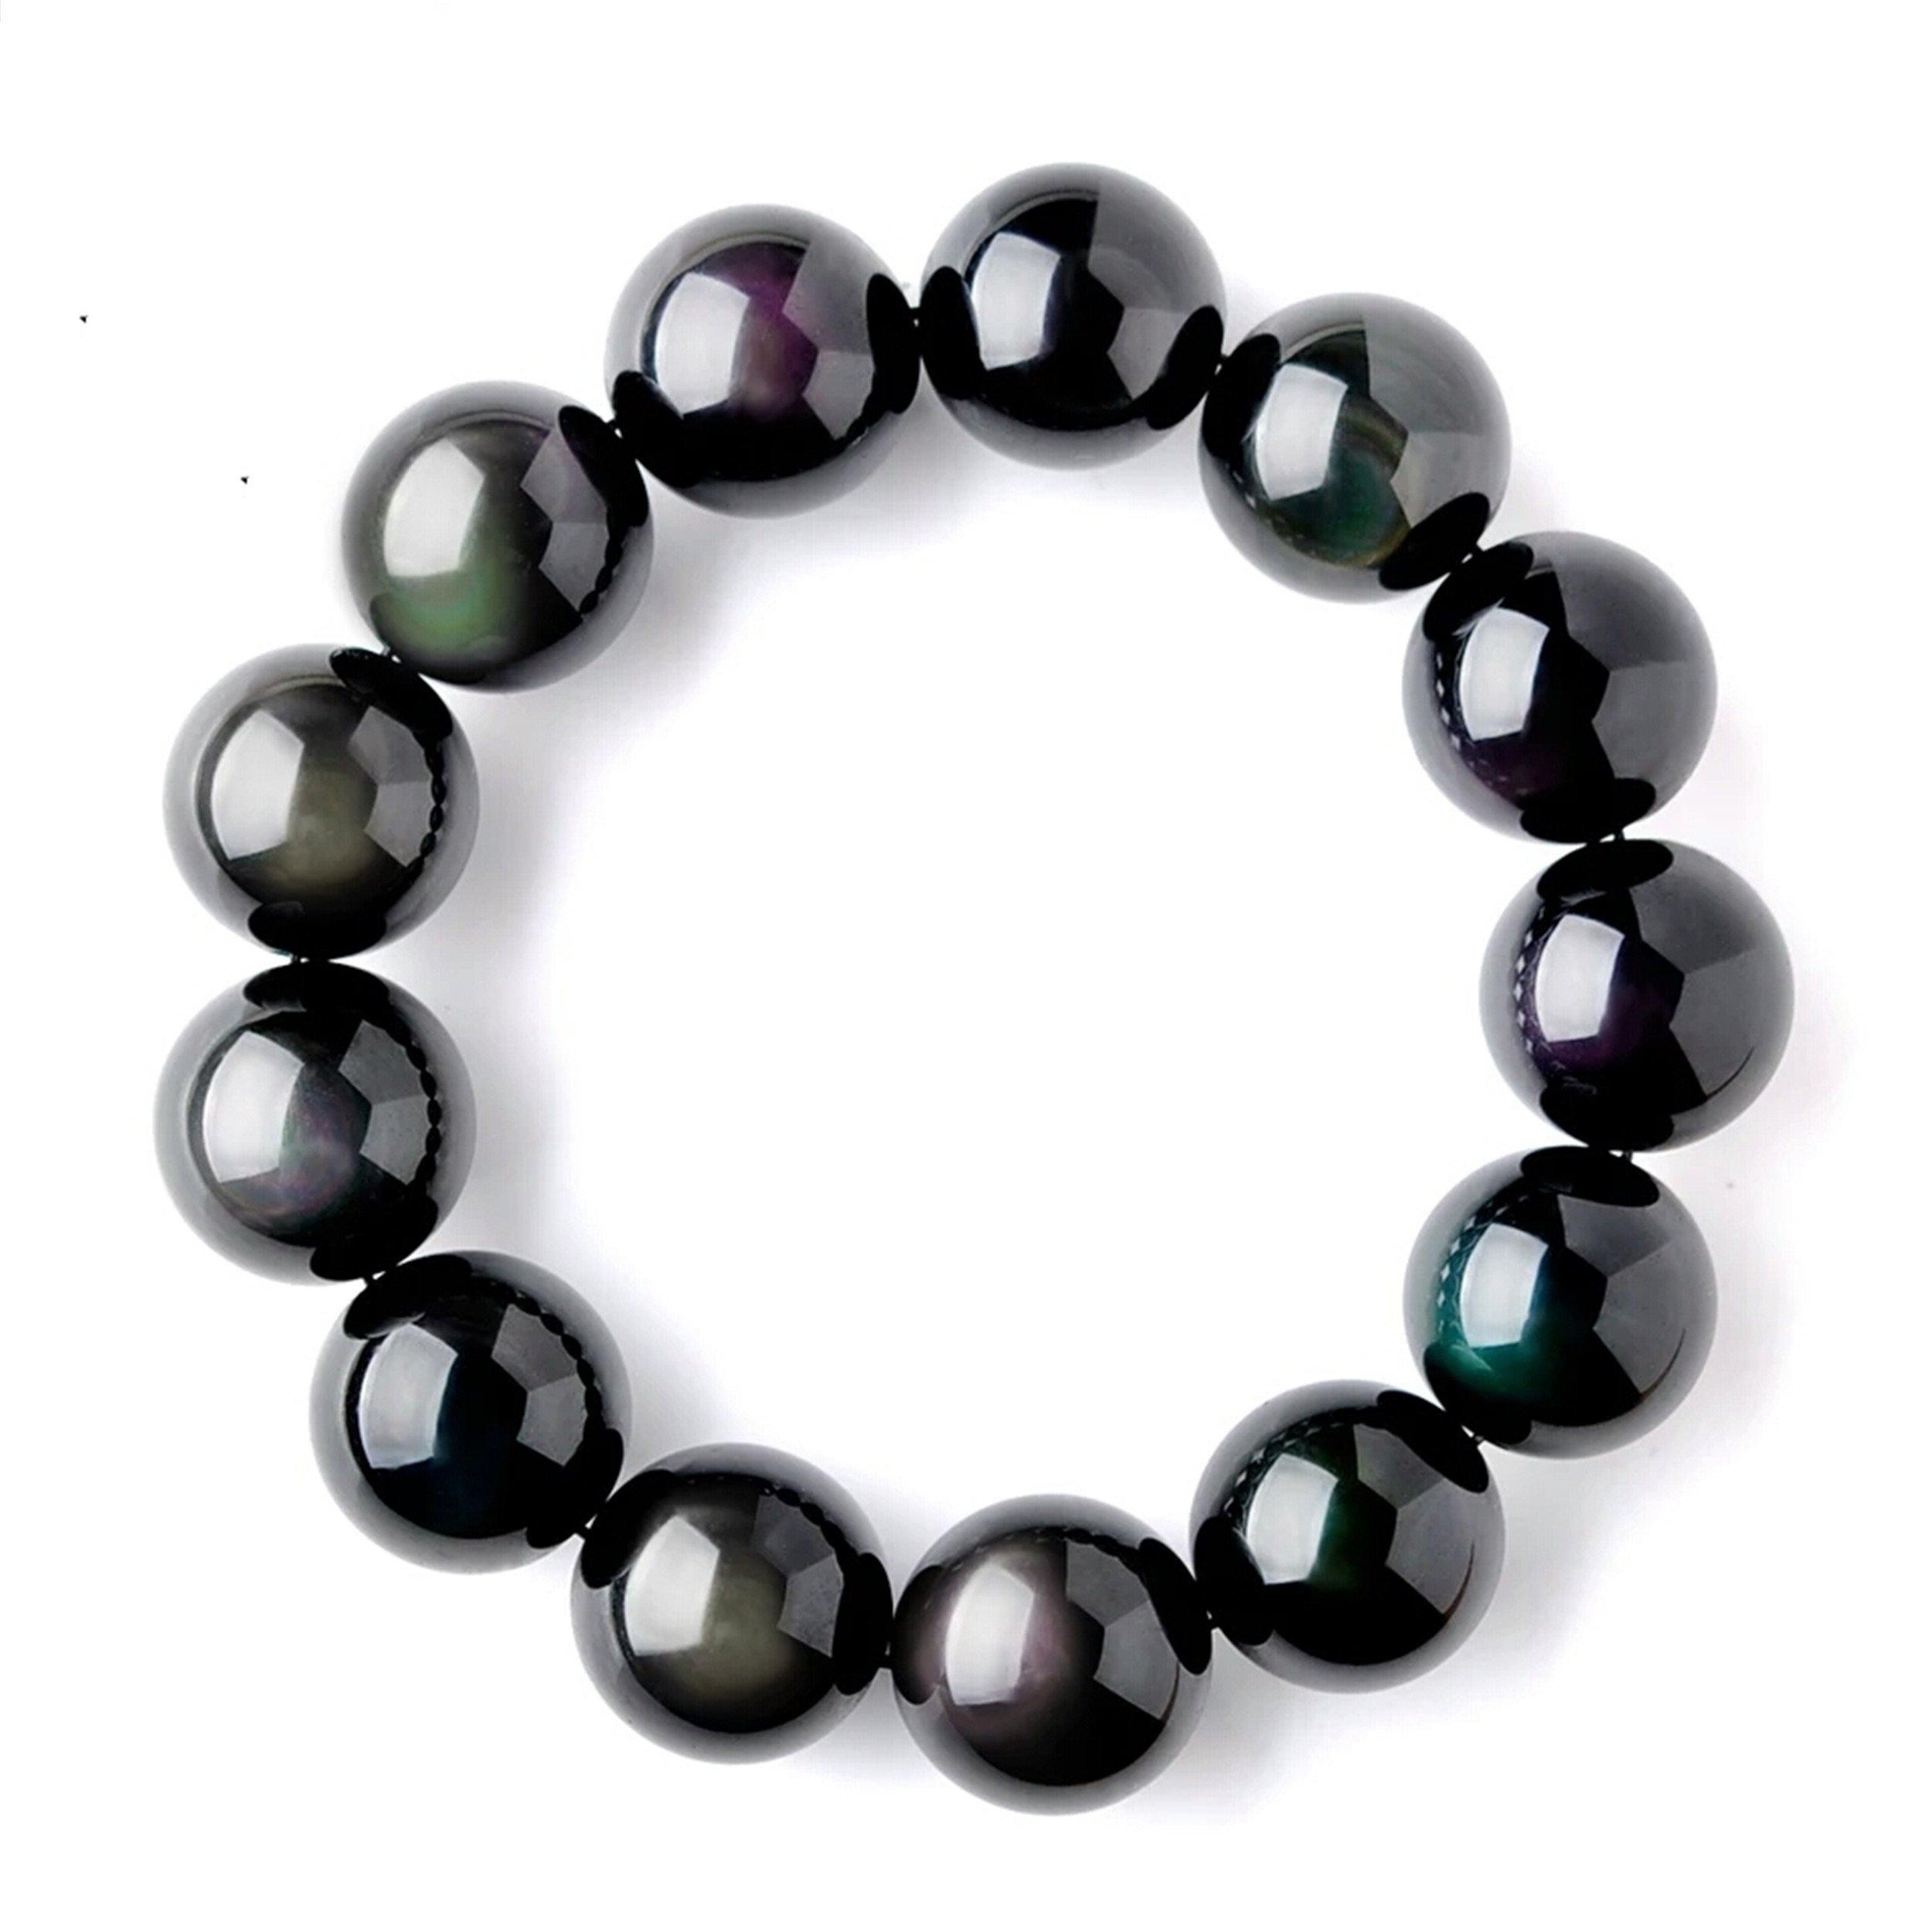 LiZiFang 18mm Genuine Colorful Natural Obsidian Gemstone Crystal Big Round Bead Bracelet AAAAA